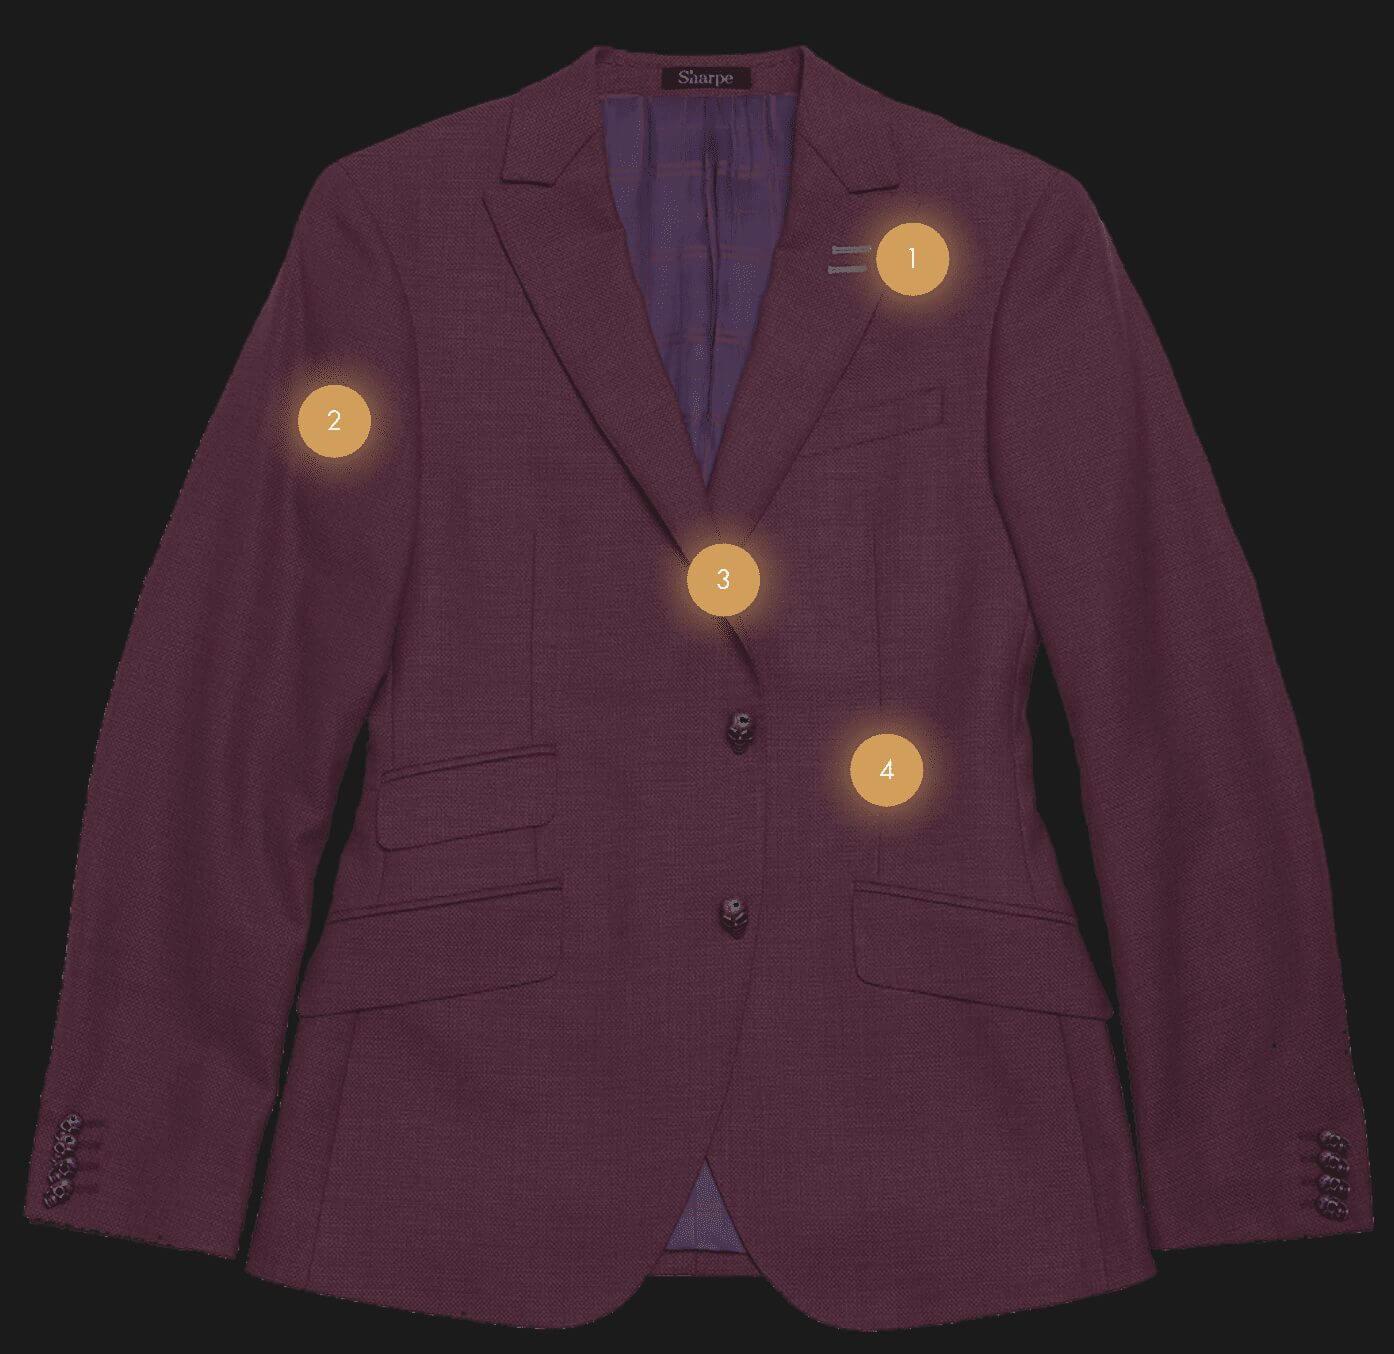 The Sharpe Experience purple suit jacket